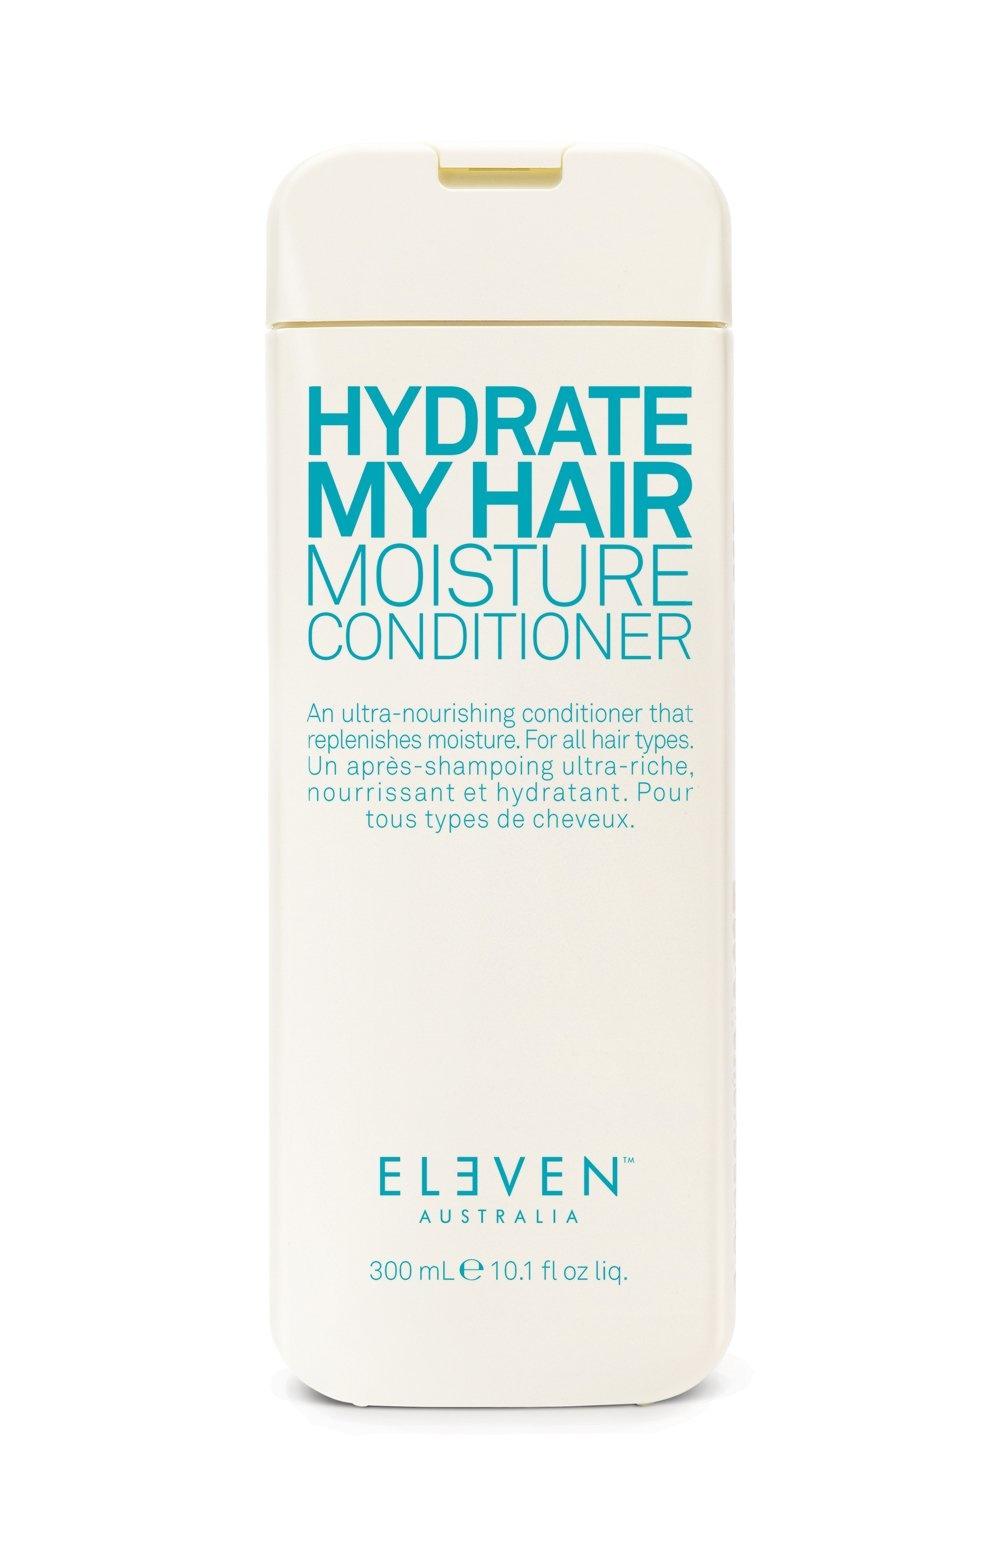 Eleven Australia Hydrate My Hair Moisture Conditioner